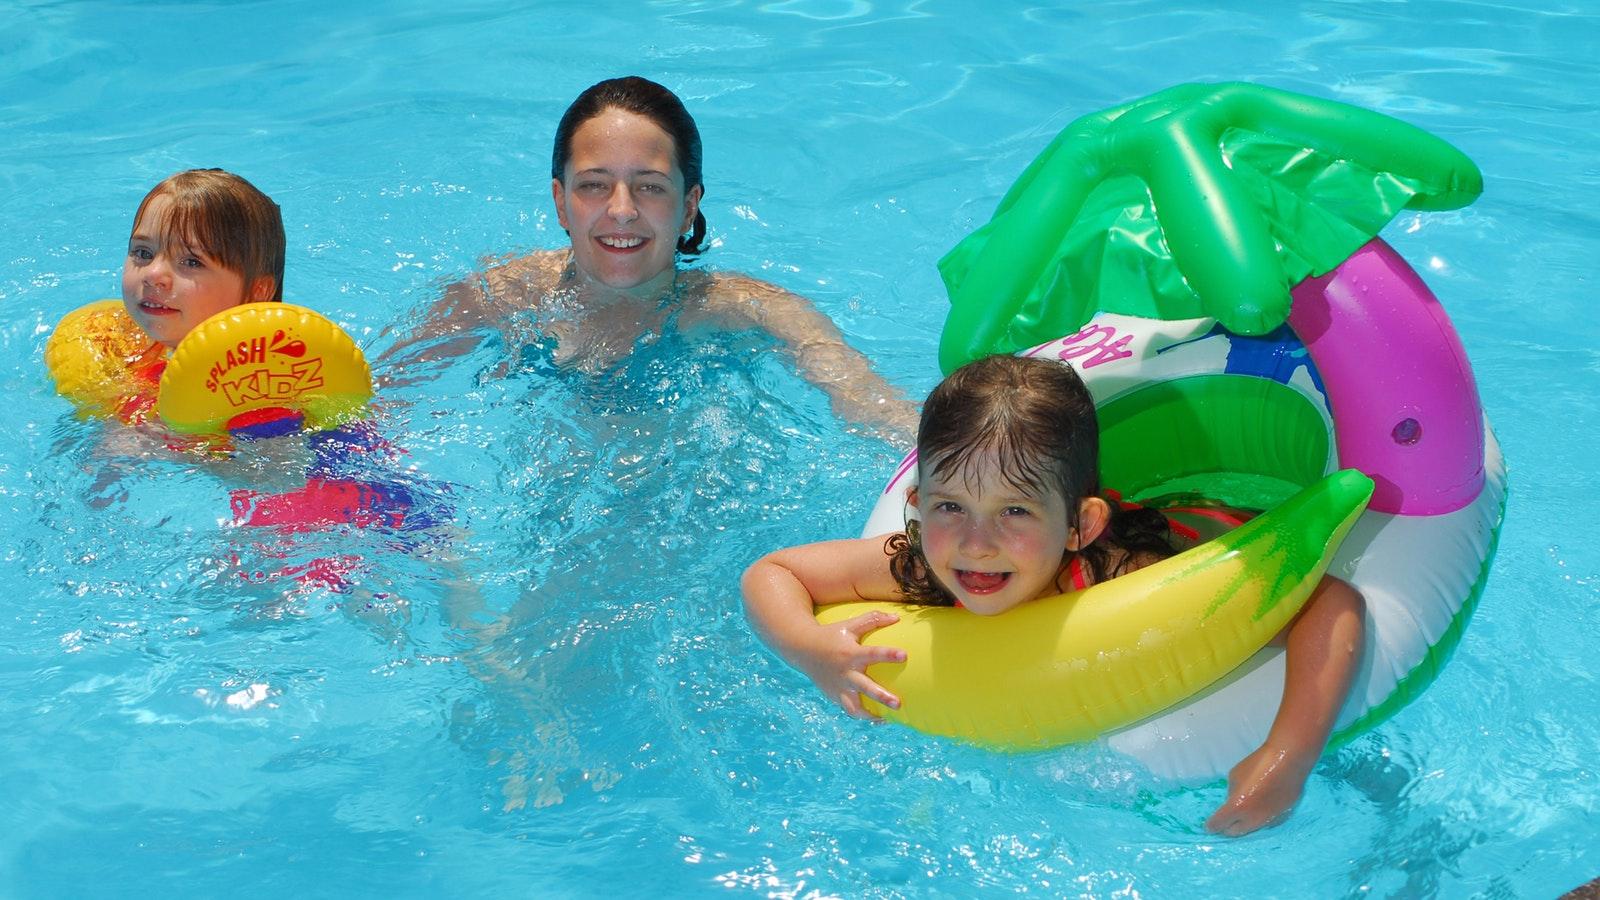 Having fun in the indoor heated pool